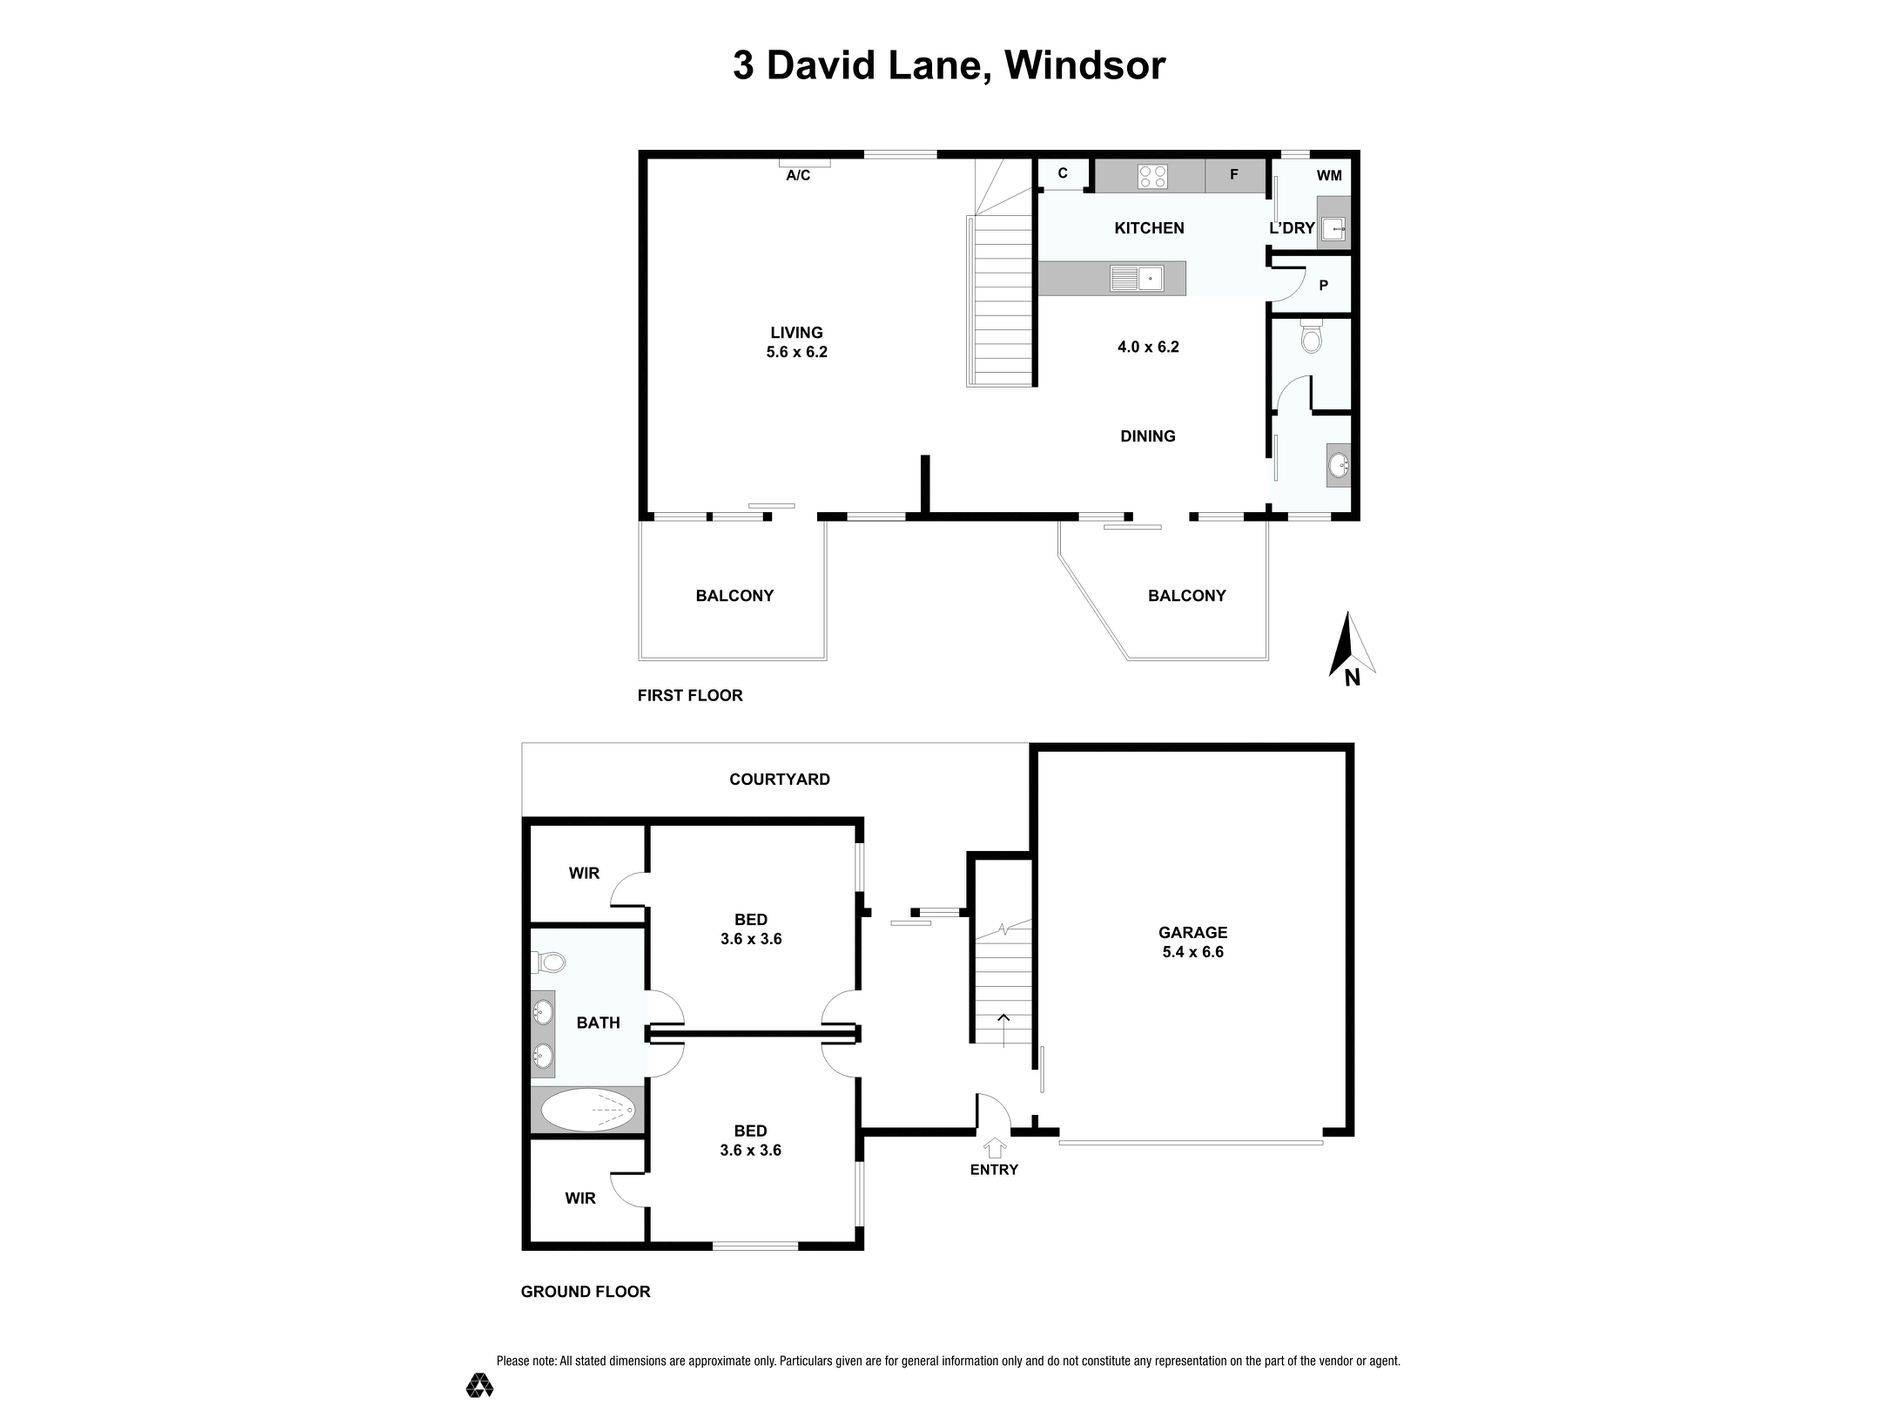 3 David Lane, Windsor